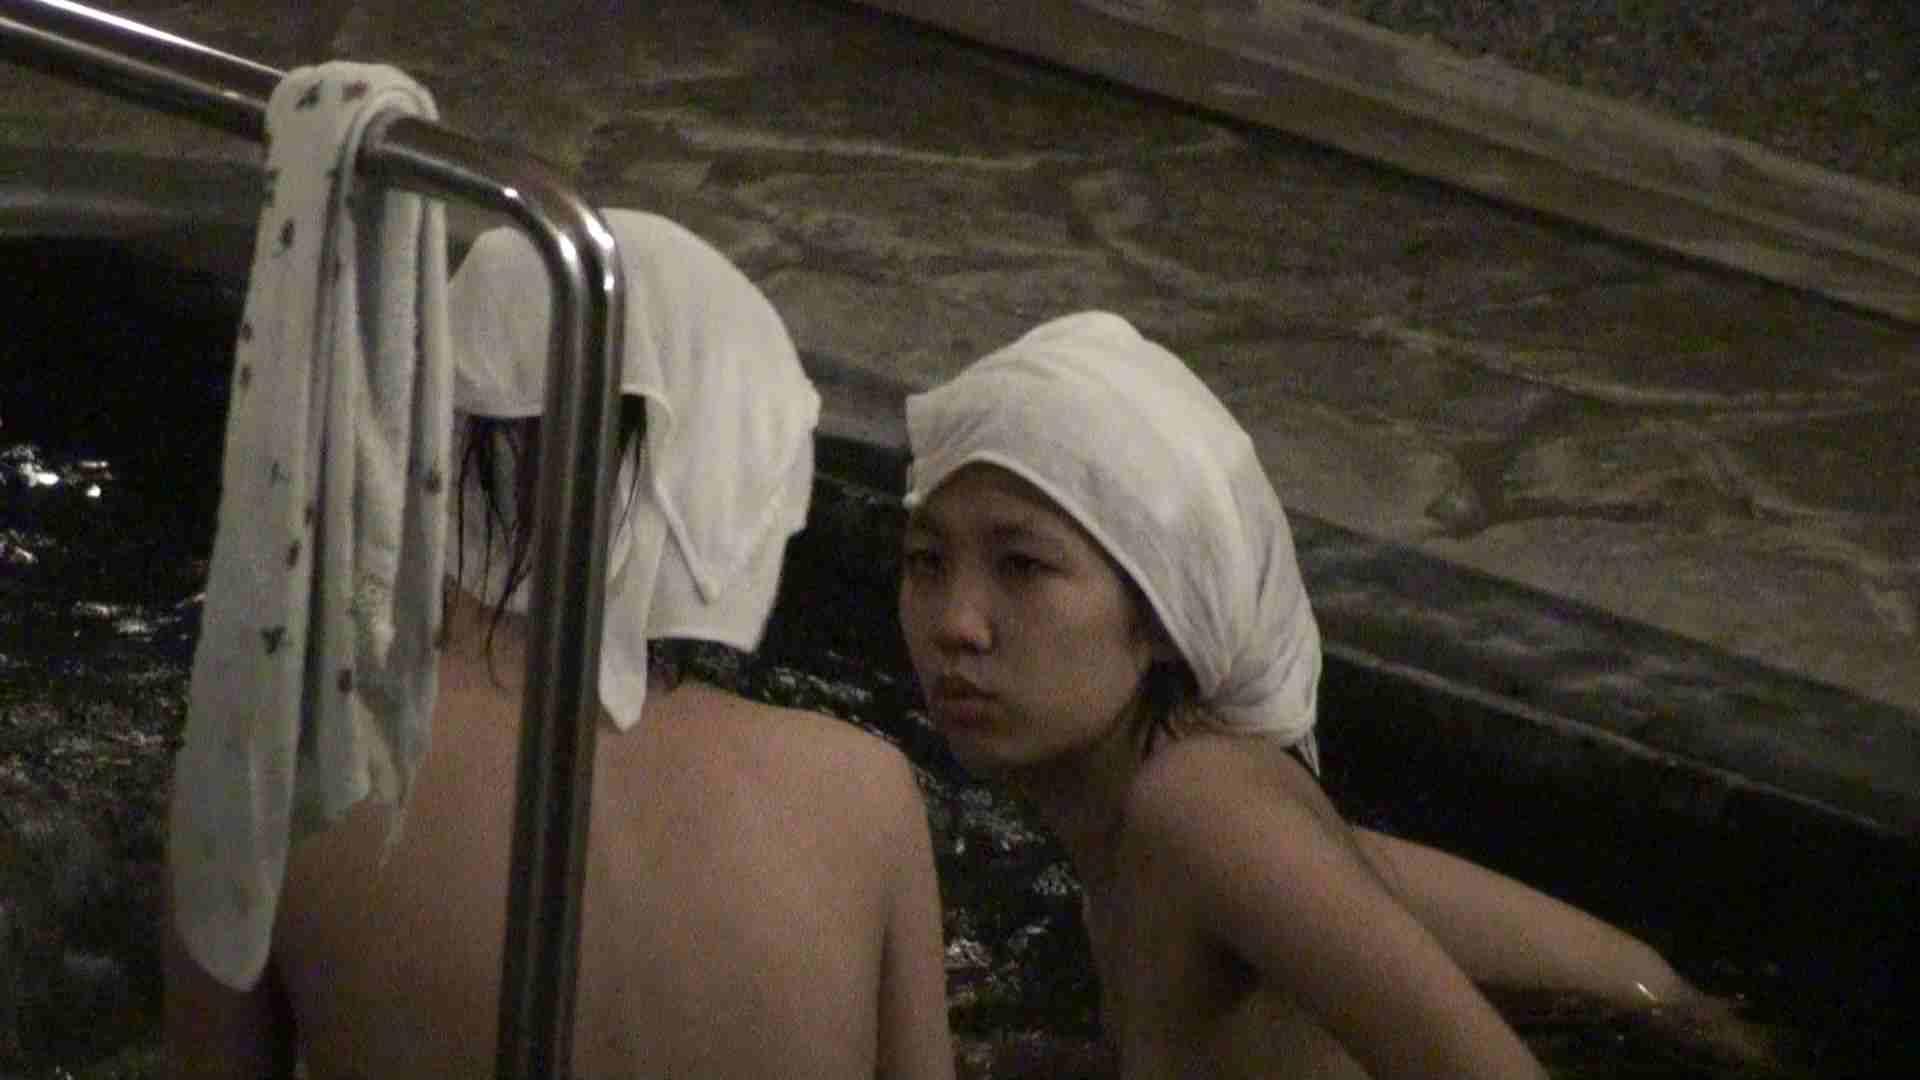 Aquaな露天風呂Vol.358 盗撮シリーズ | 露天風呂編  104PIX 7